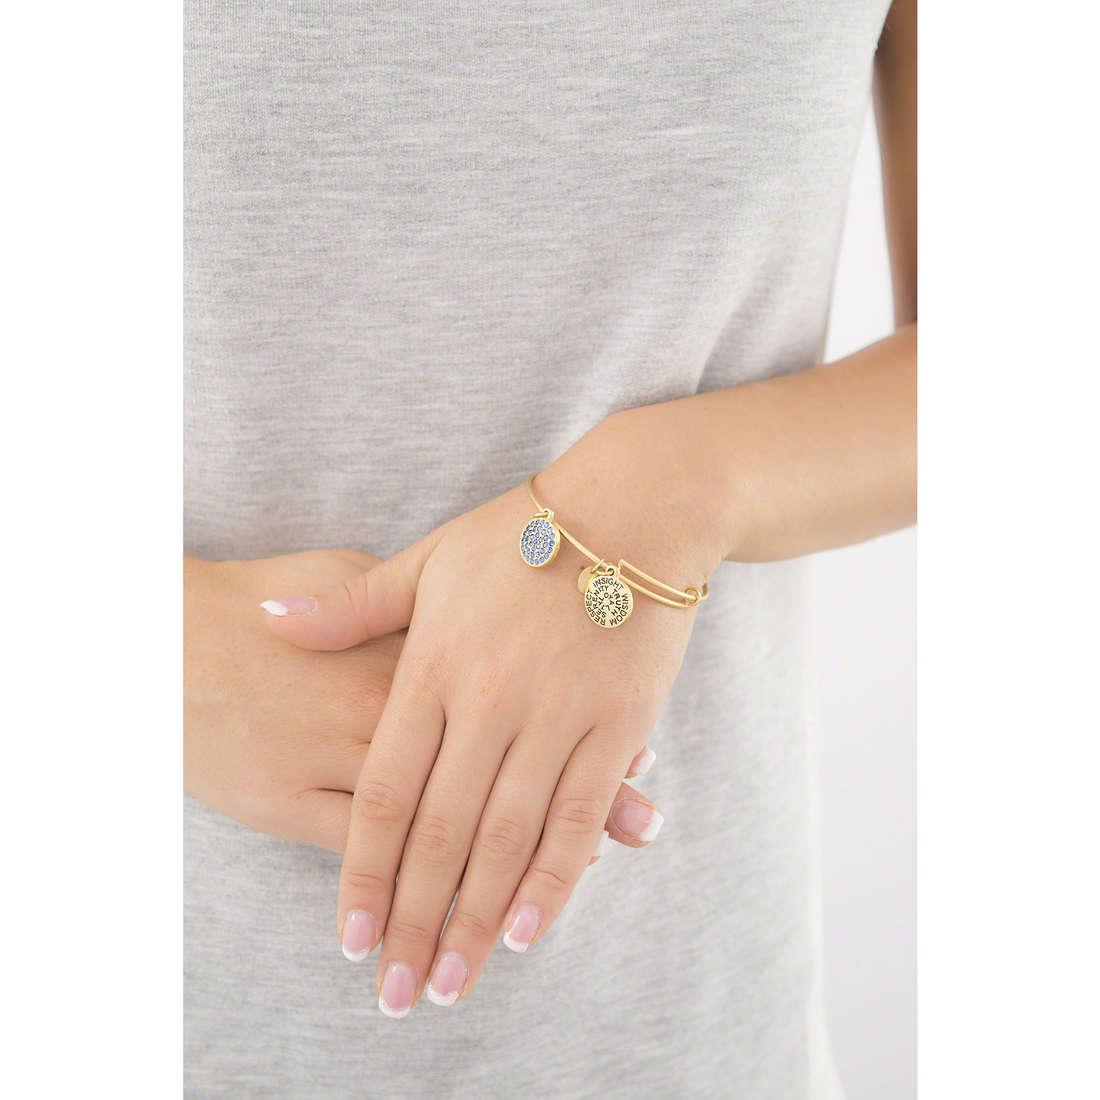 Chrysalis bracciali donna CRBT0103GP indosso